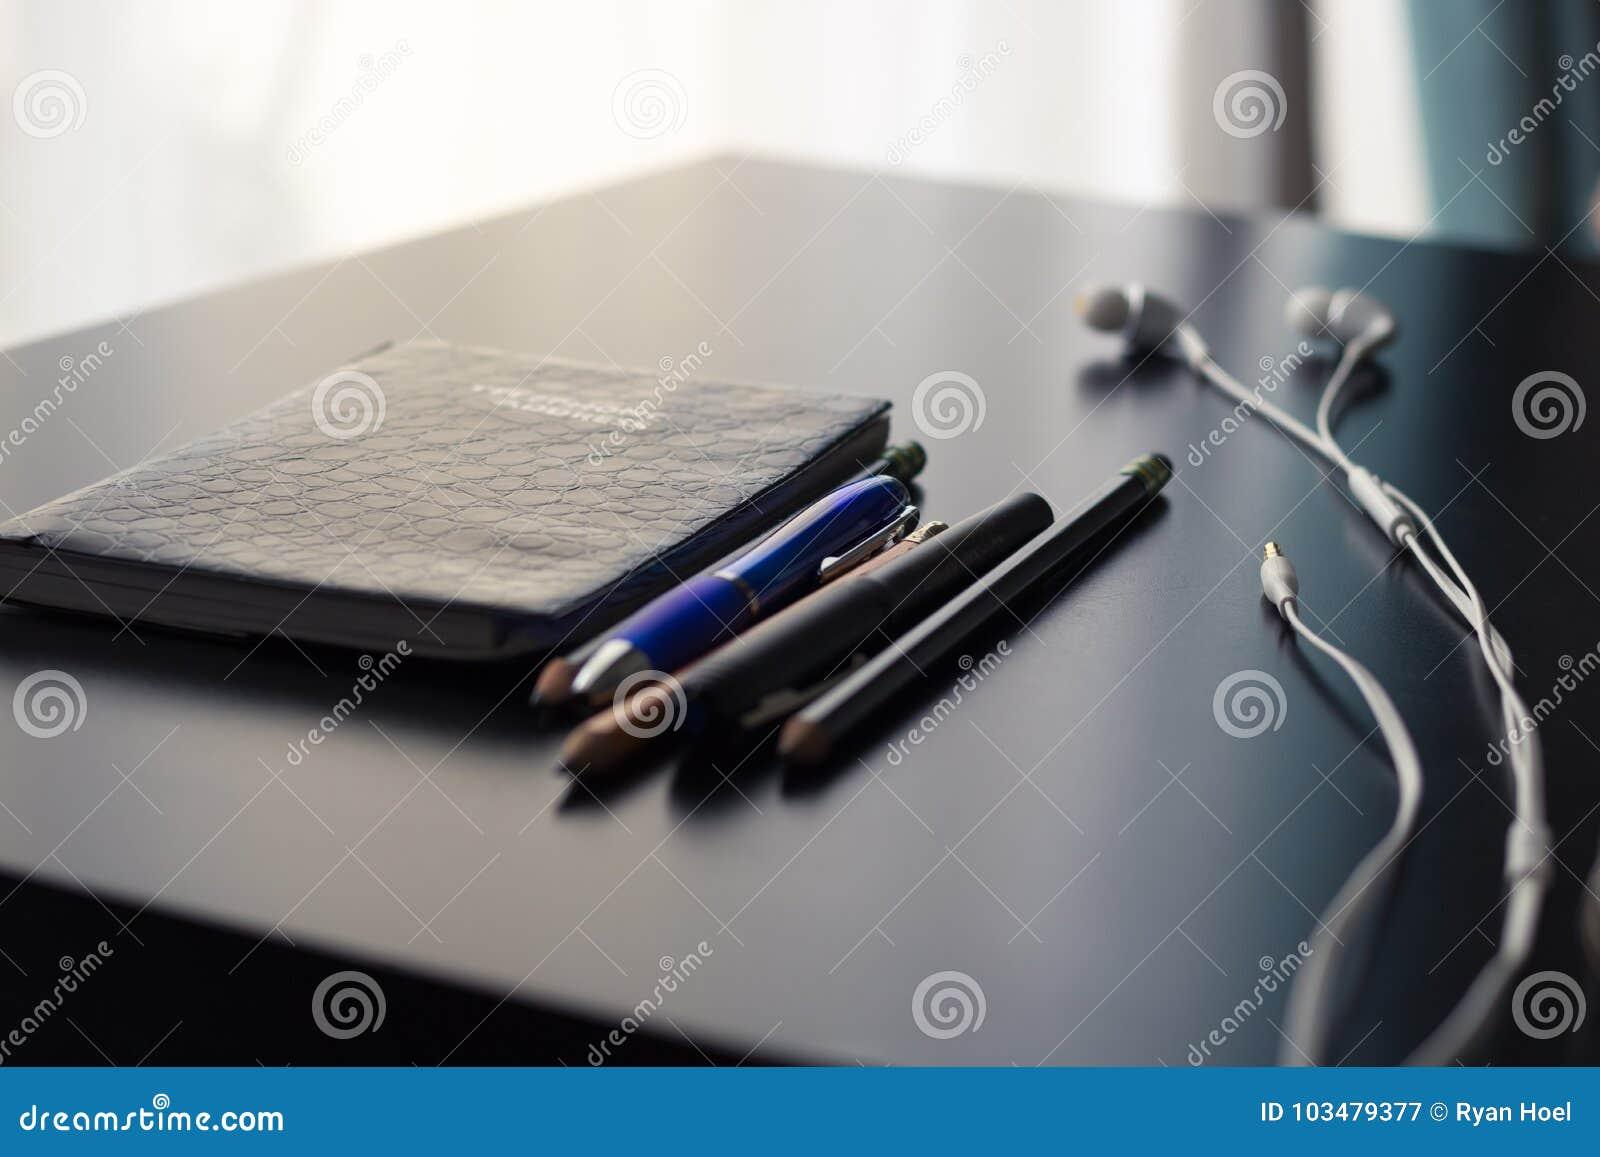 Equipamento de escritório sobre a mesa